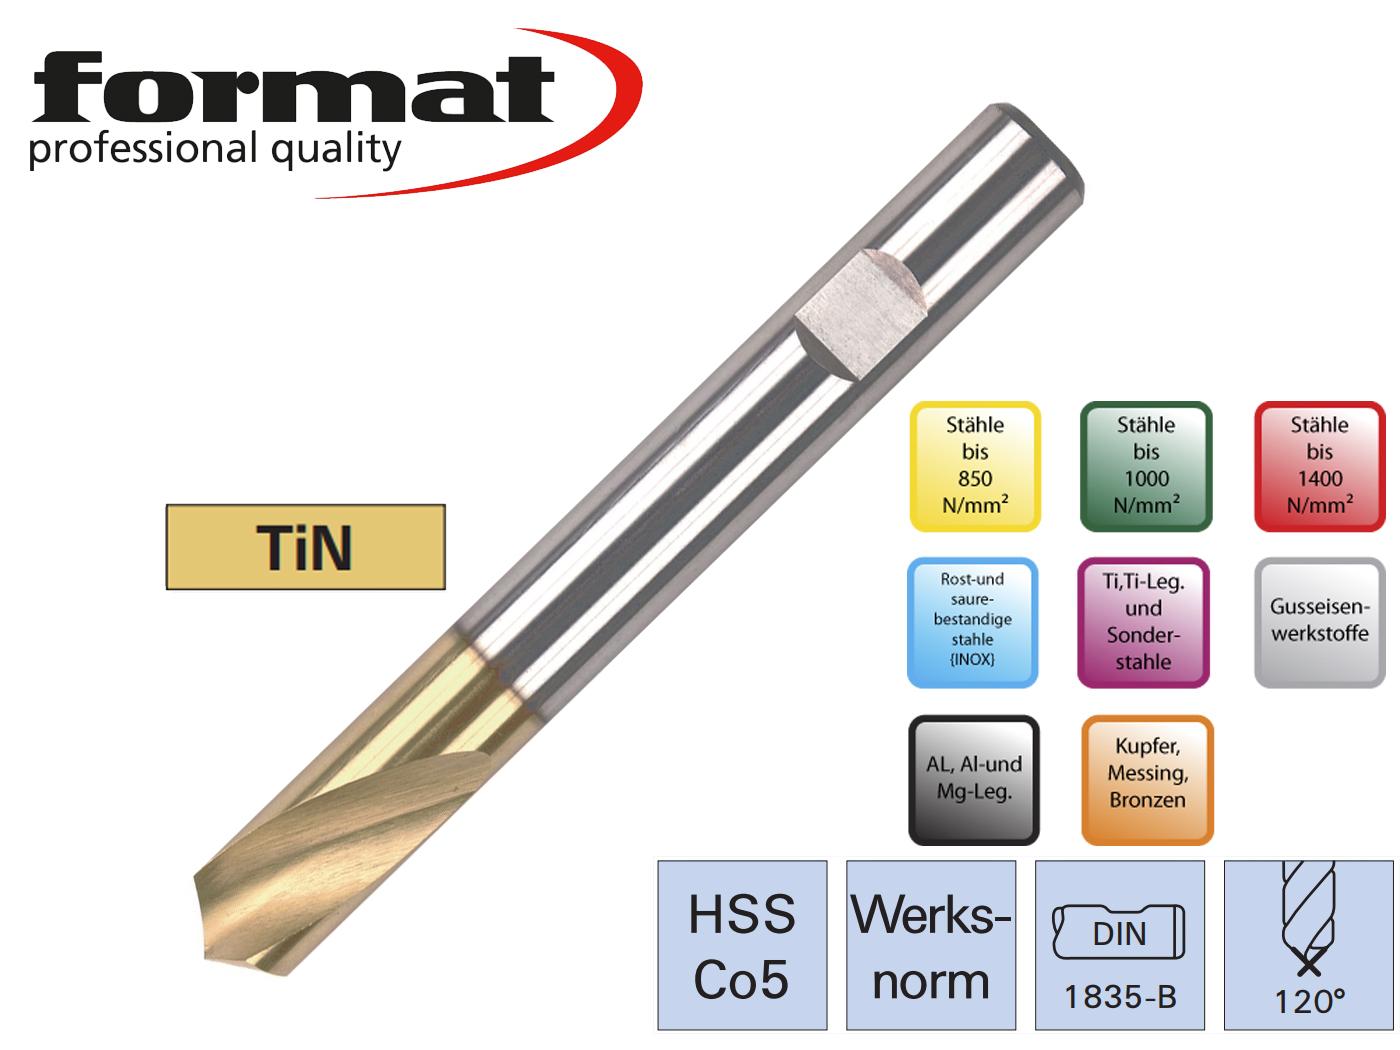 Centerboor NC DIN 1835 B HSSCo5 120G TiN FORMAT | DKMTools - DKM Tools